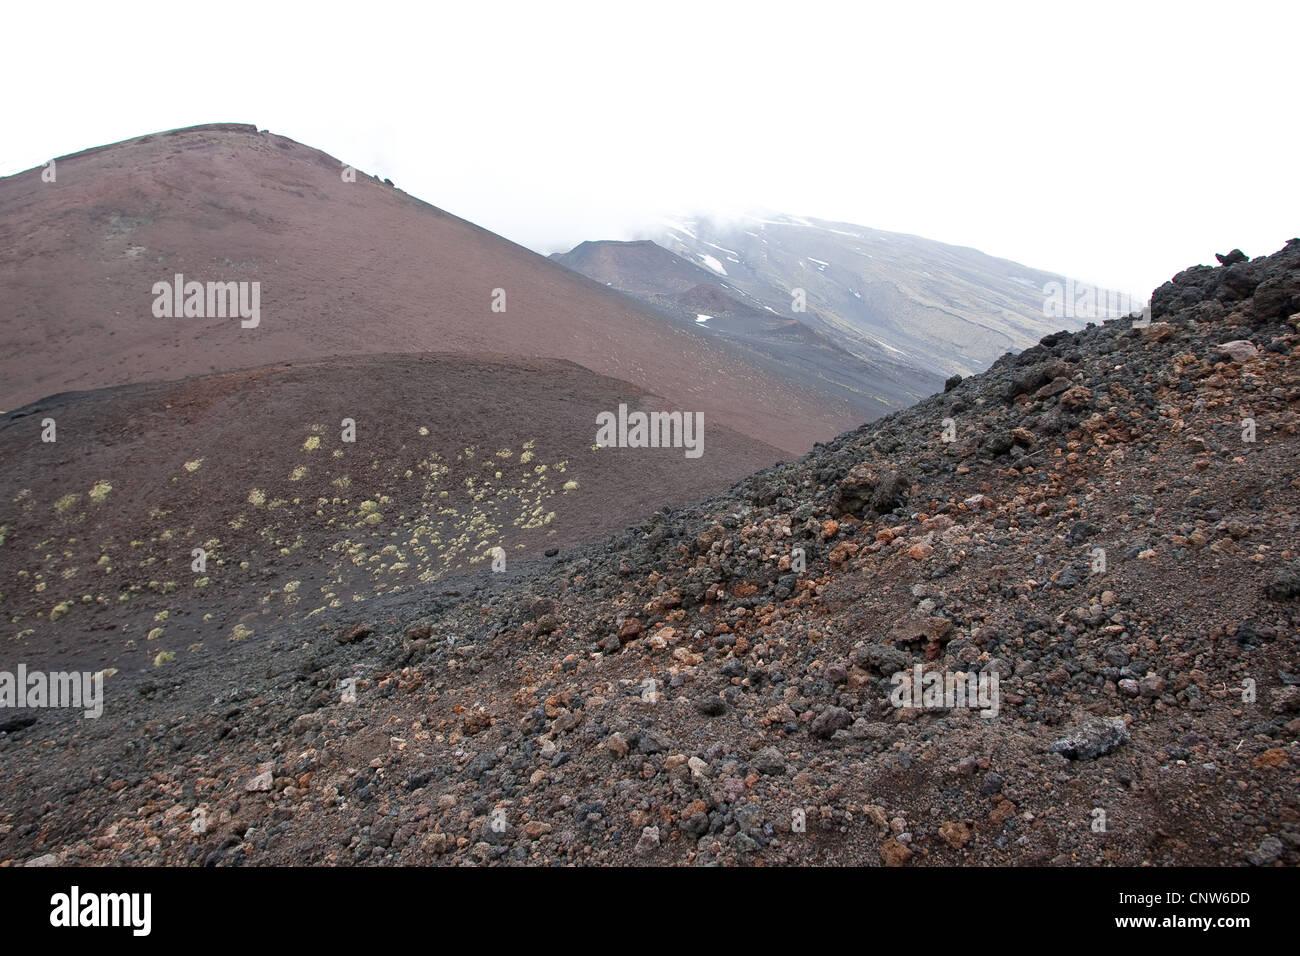 volcanic landscapes at Mount Etna, Italy, Sicilia - Stock Image